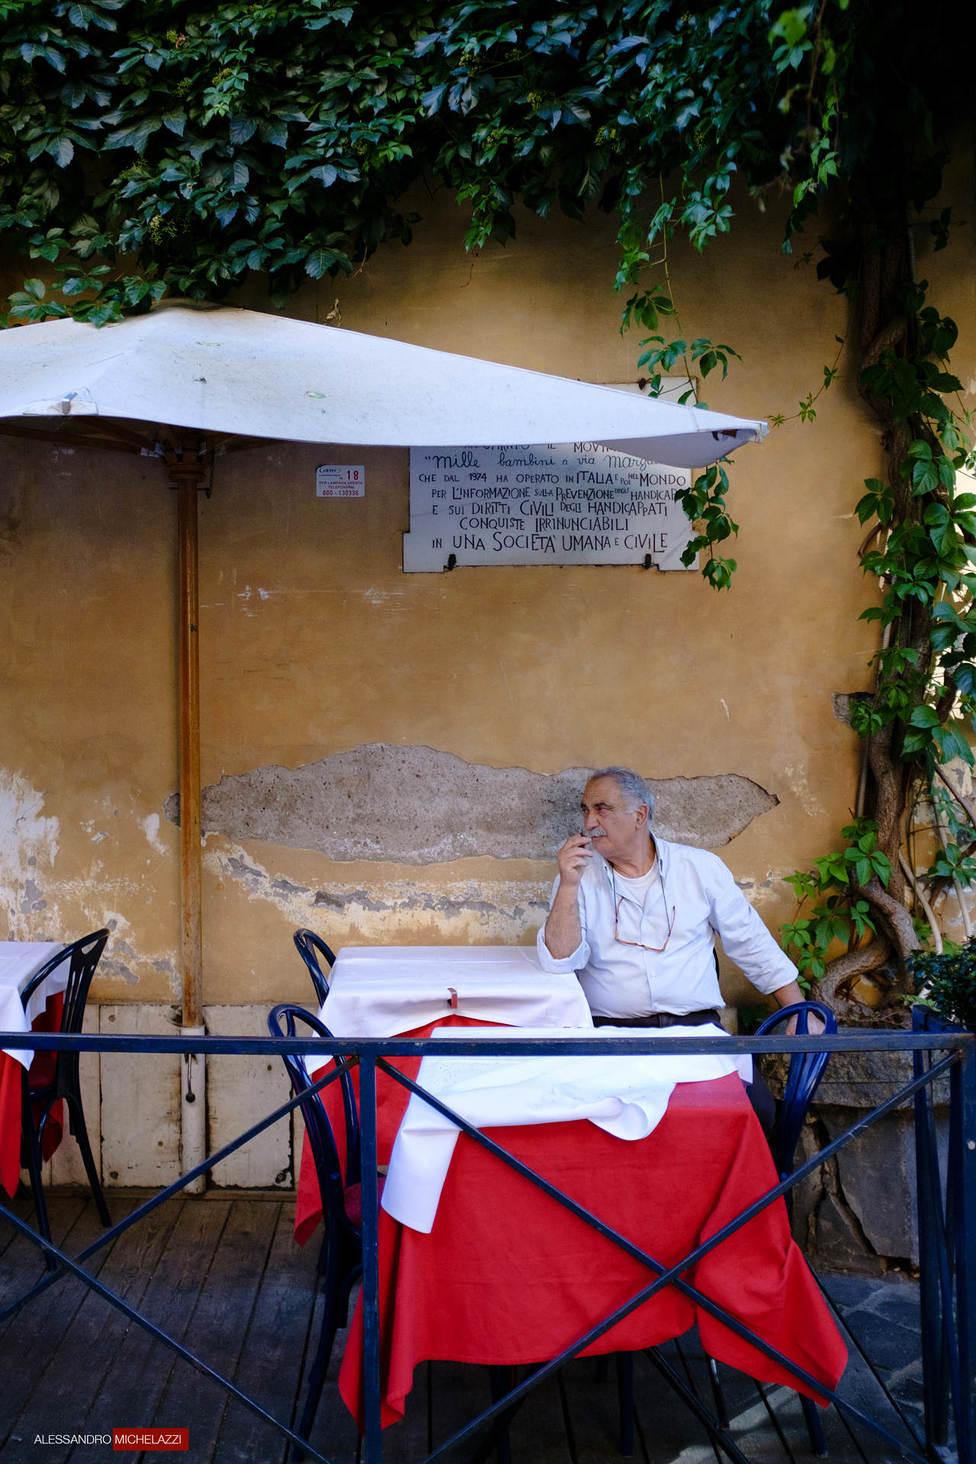 Street Photography in Via Margutta